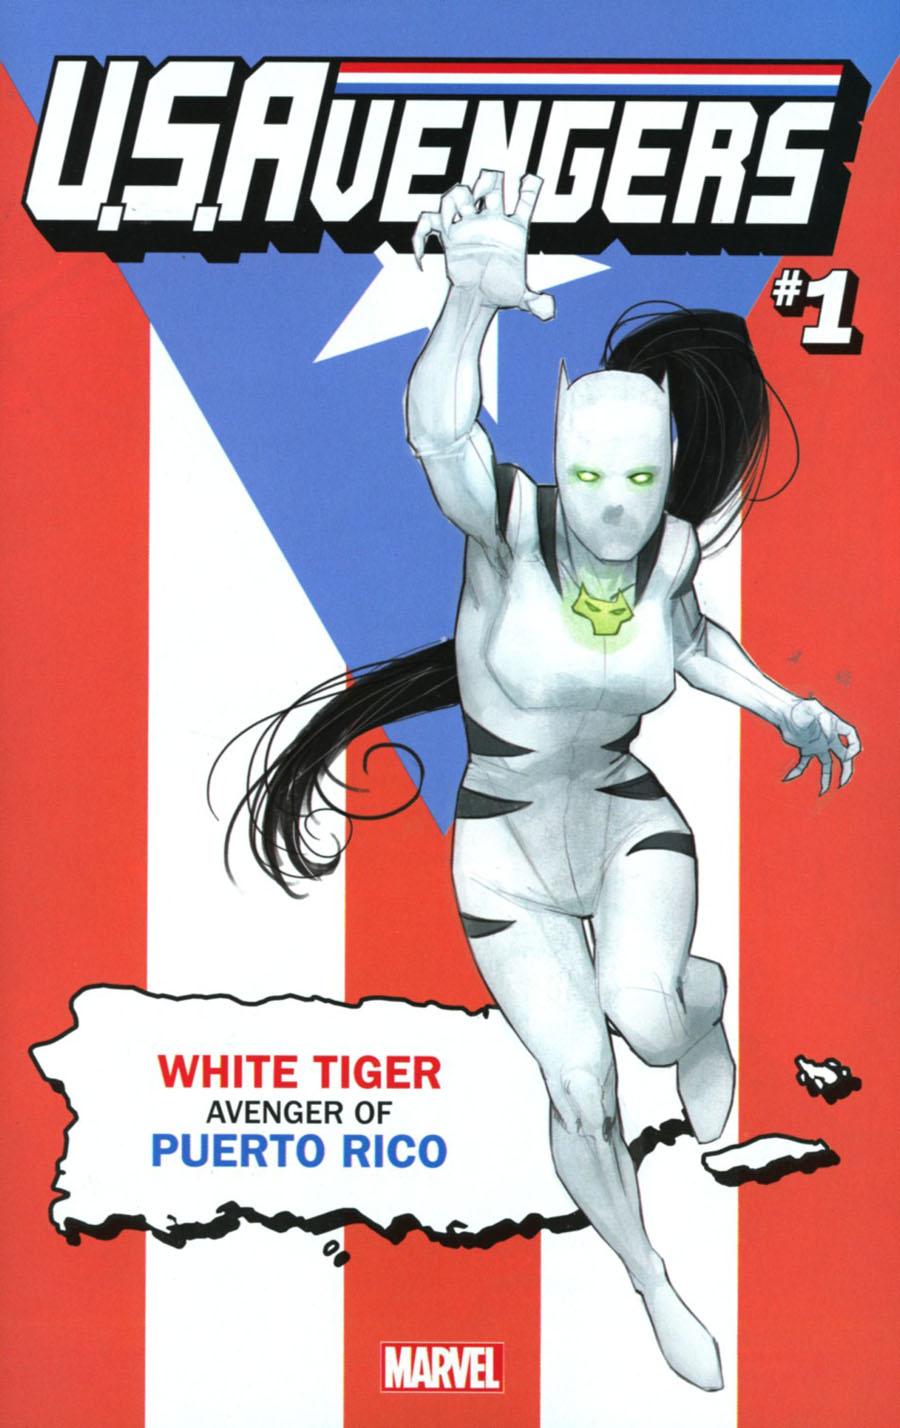 U.S.Avengers #1 Cover Z-T Variant Rod Reis Puerto Rico Cover (Marvel Now Tie-In)